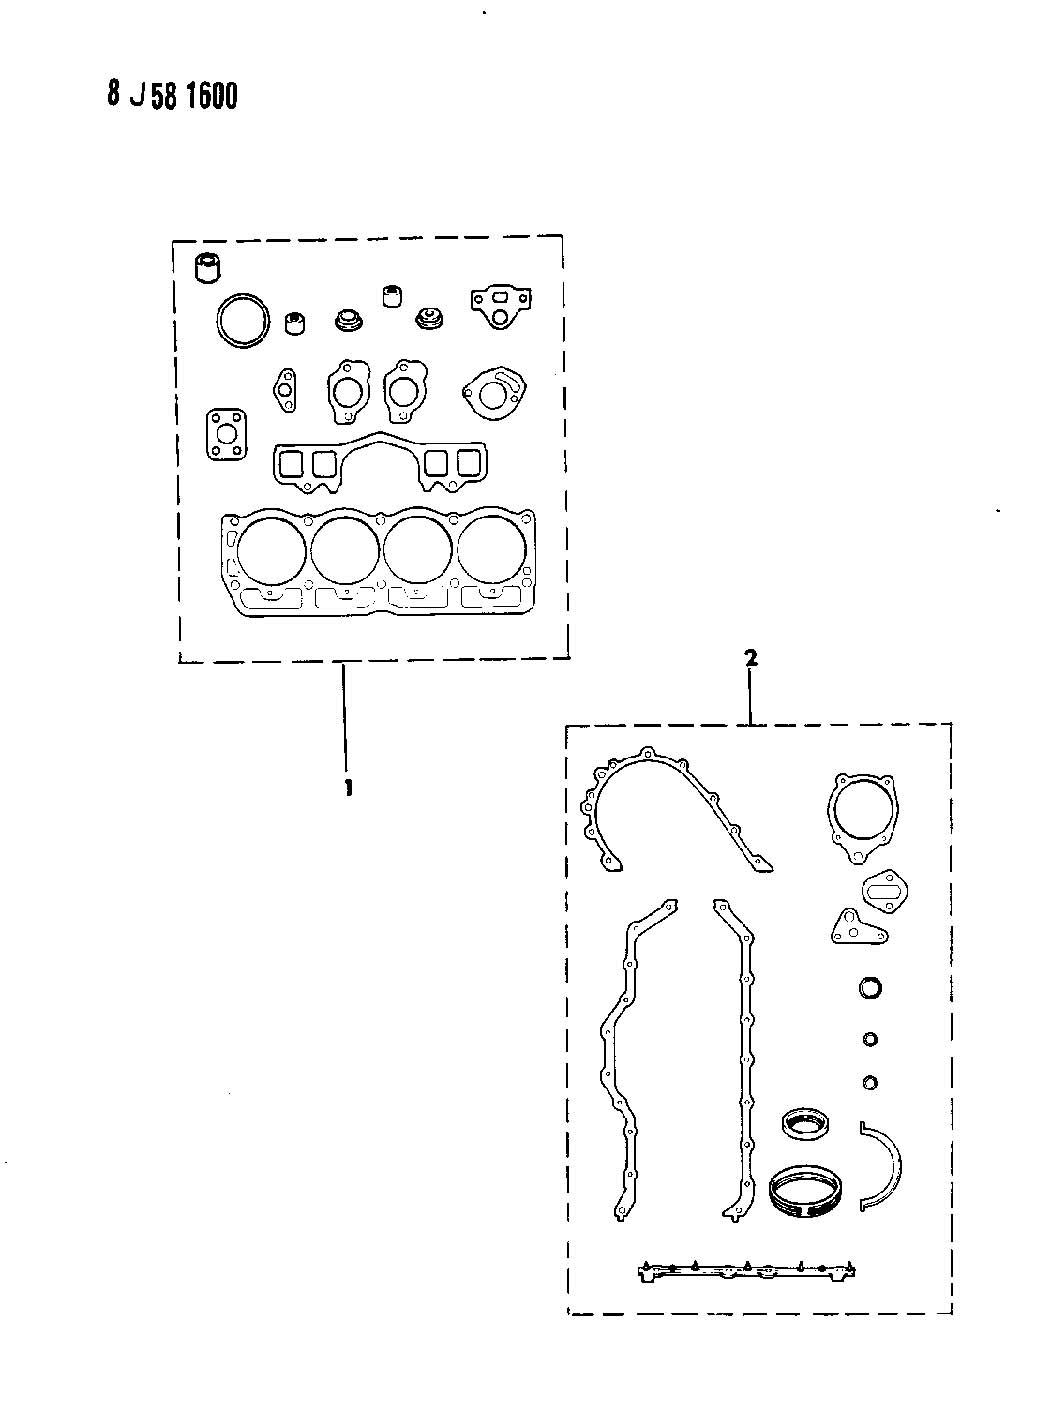 jeep wagoneer wiring diagram get free image about wiring diagram